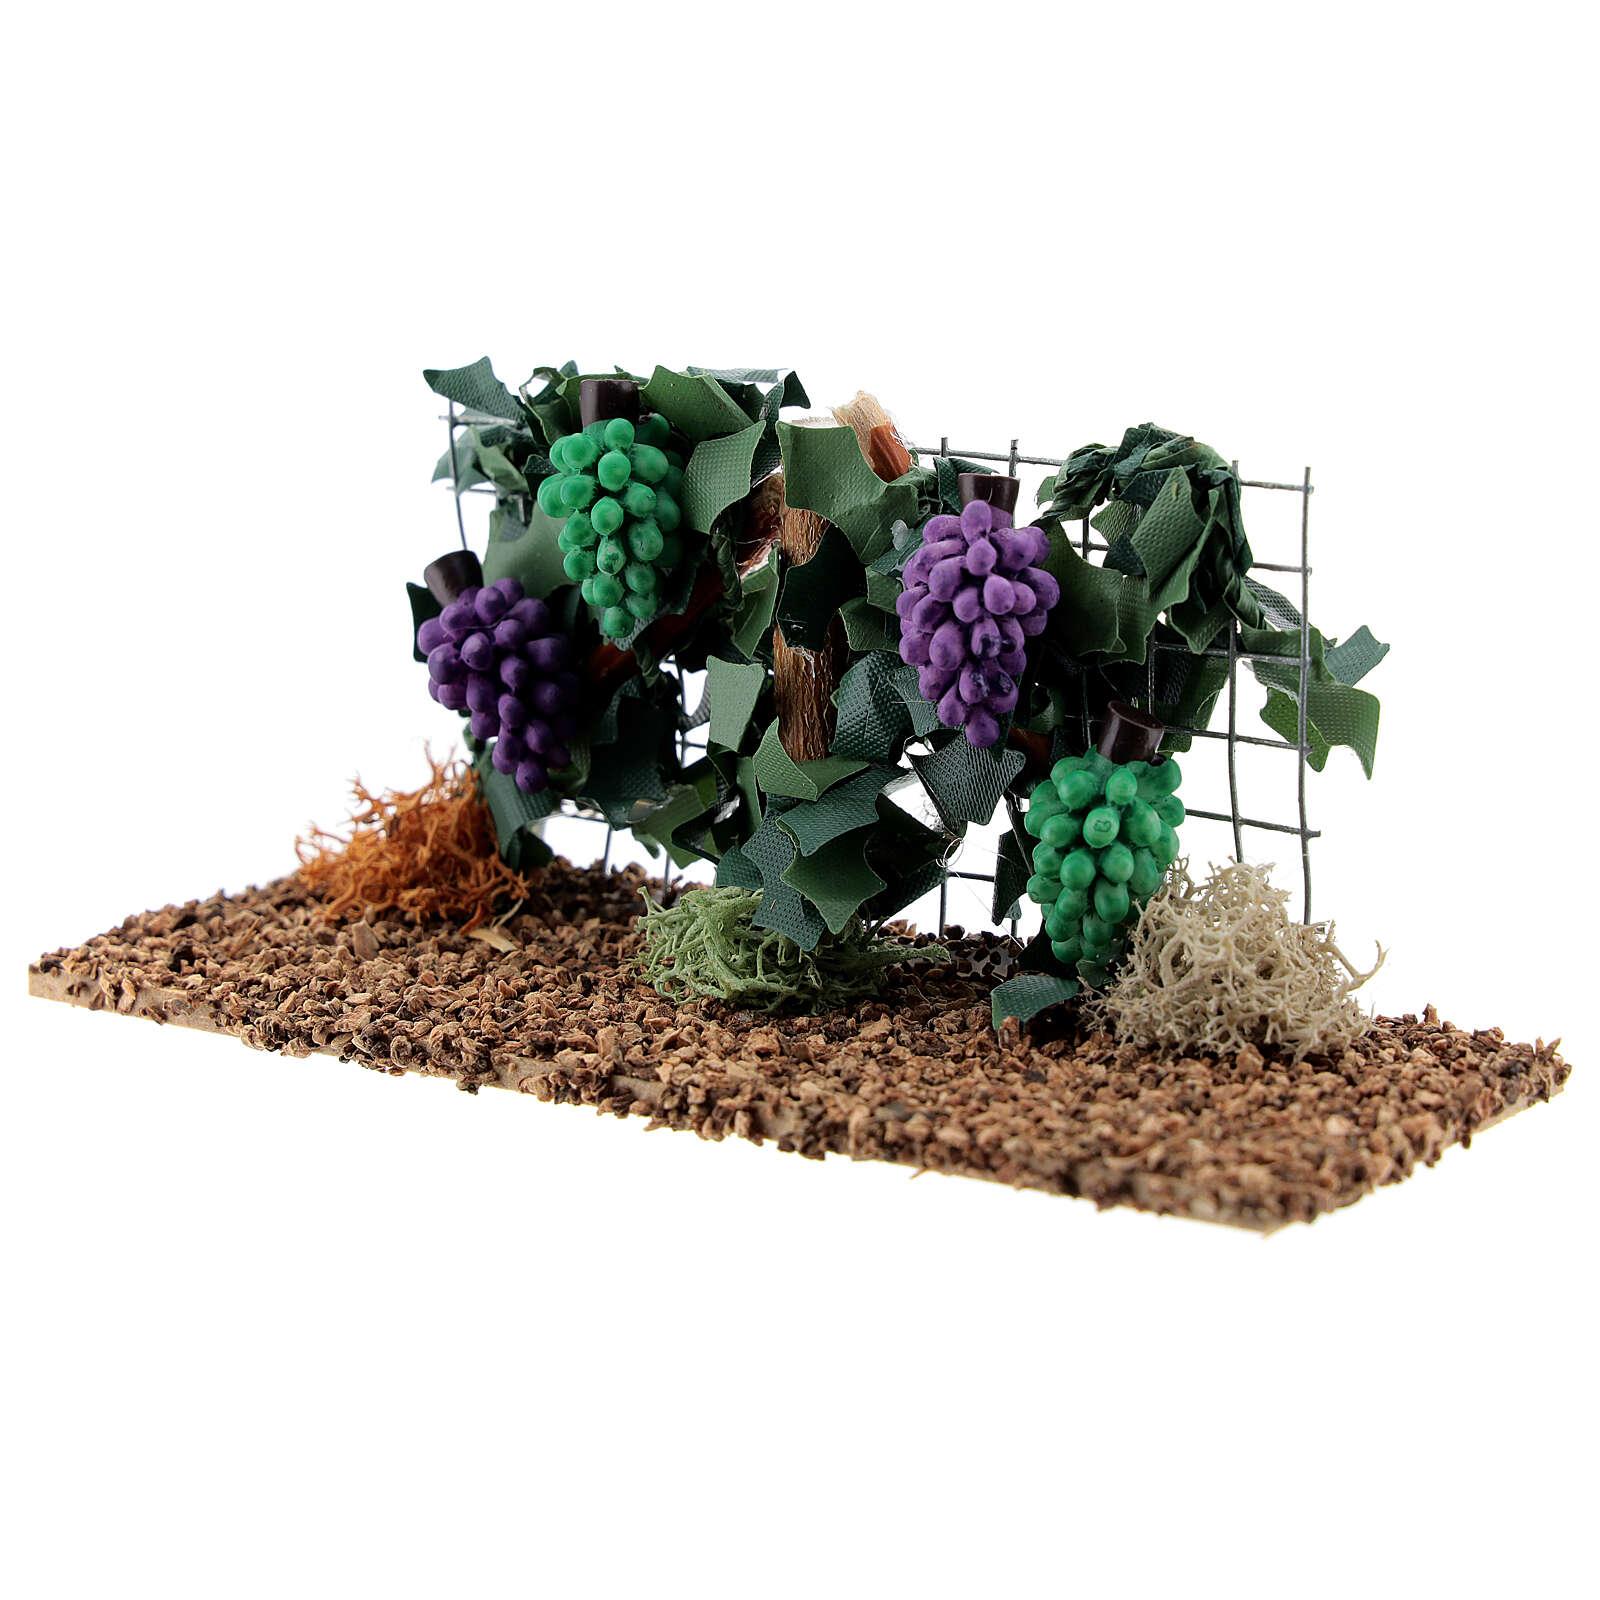 Grapevine with grape resin Nativity scene 6-8 cm 4